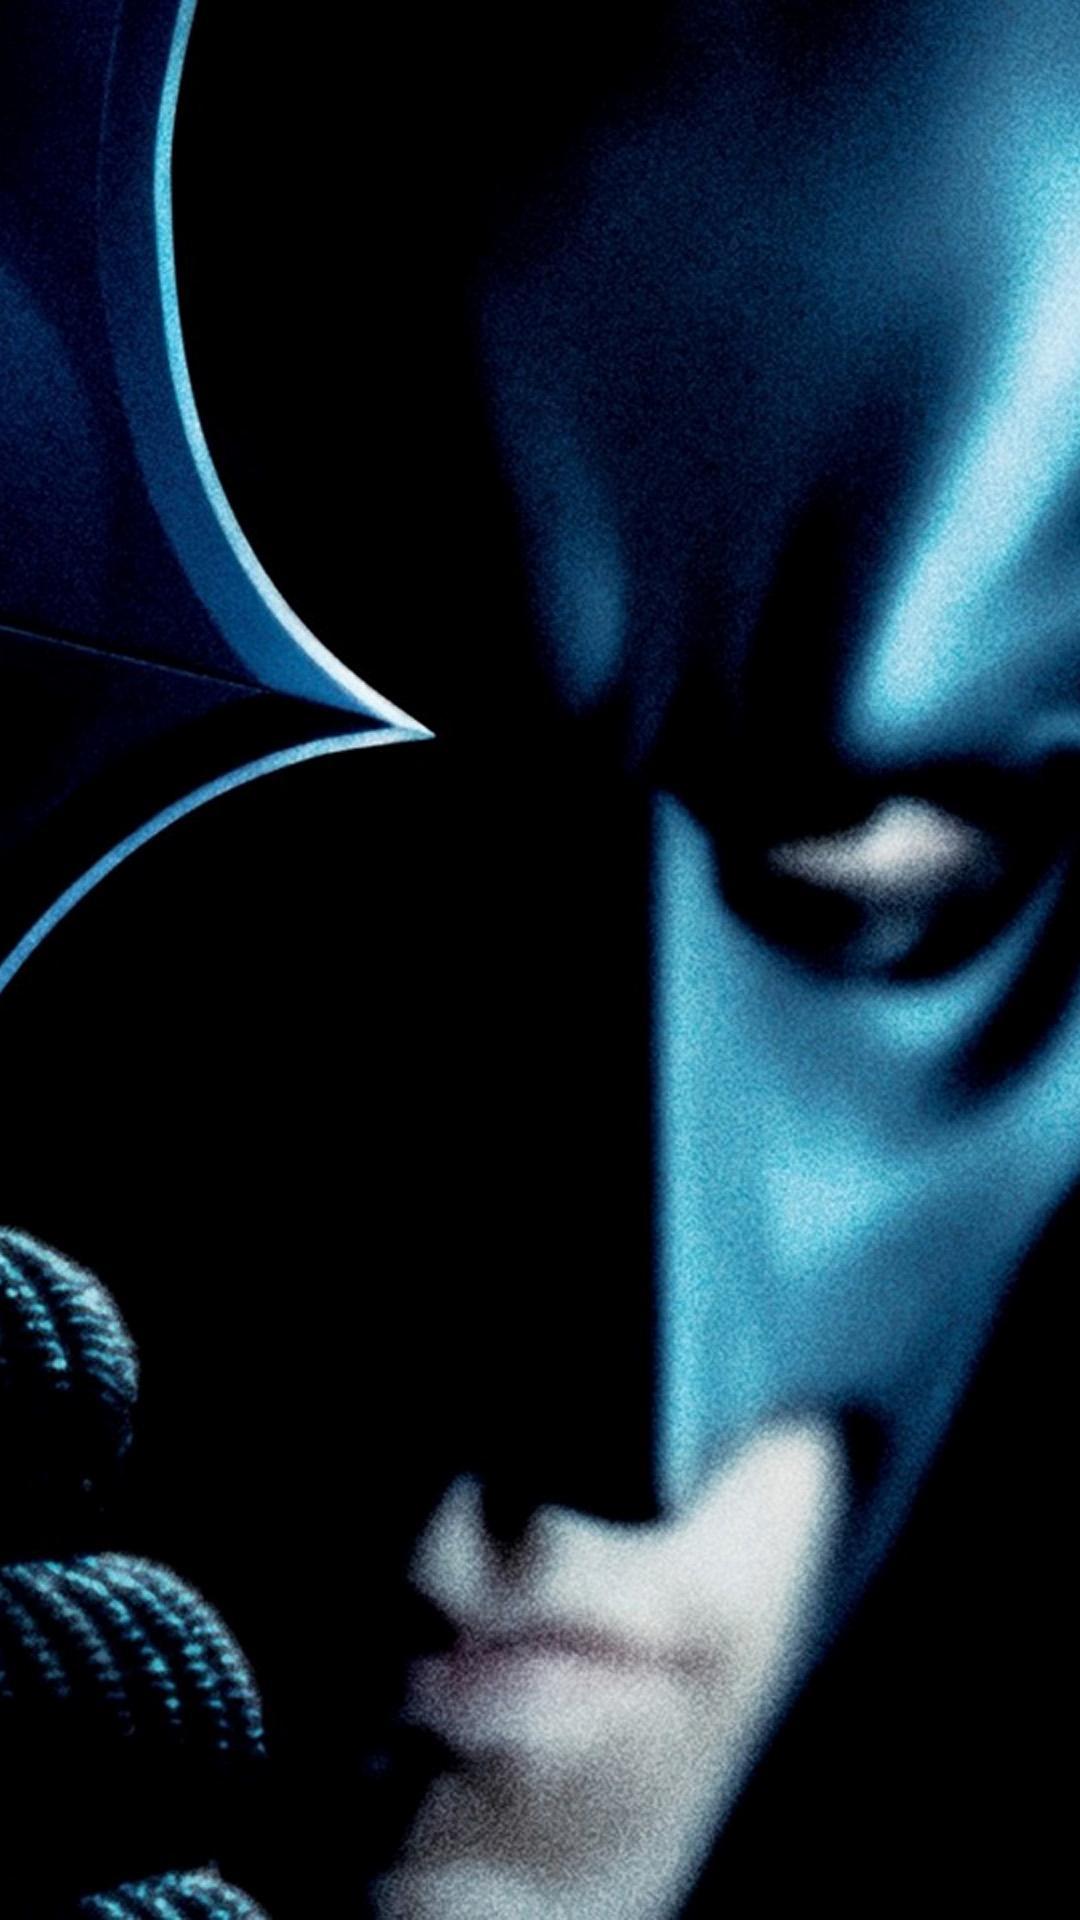 batman wallpapers iphone 6 plus batman the dark knight